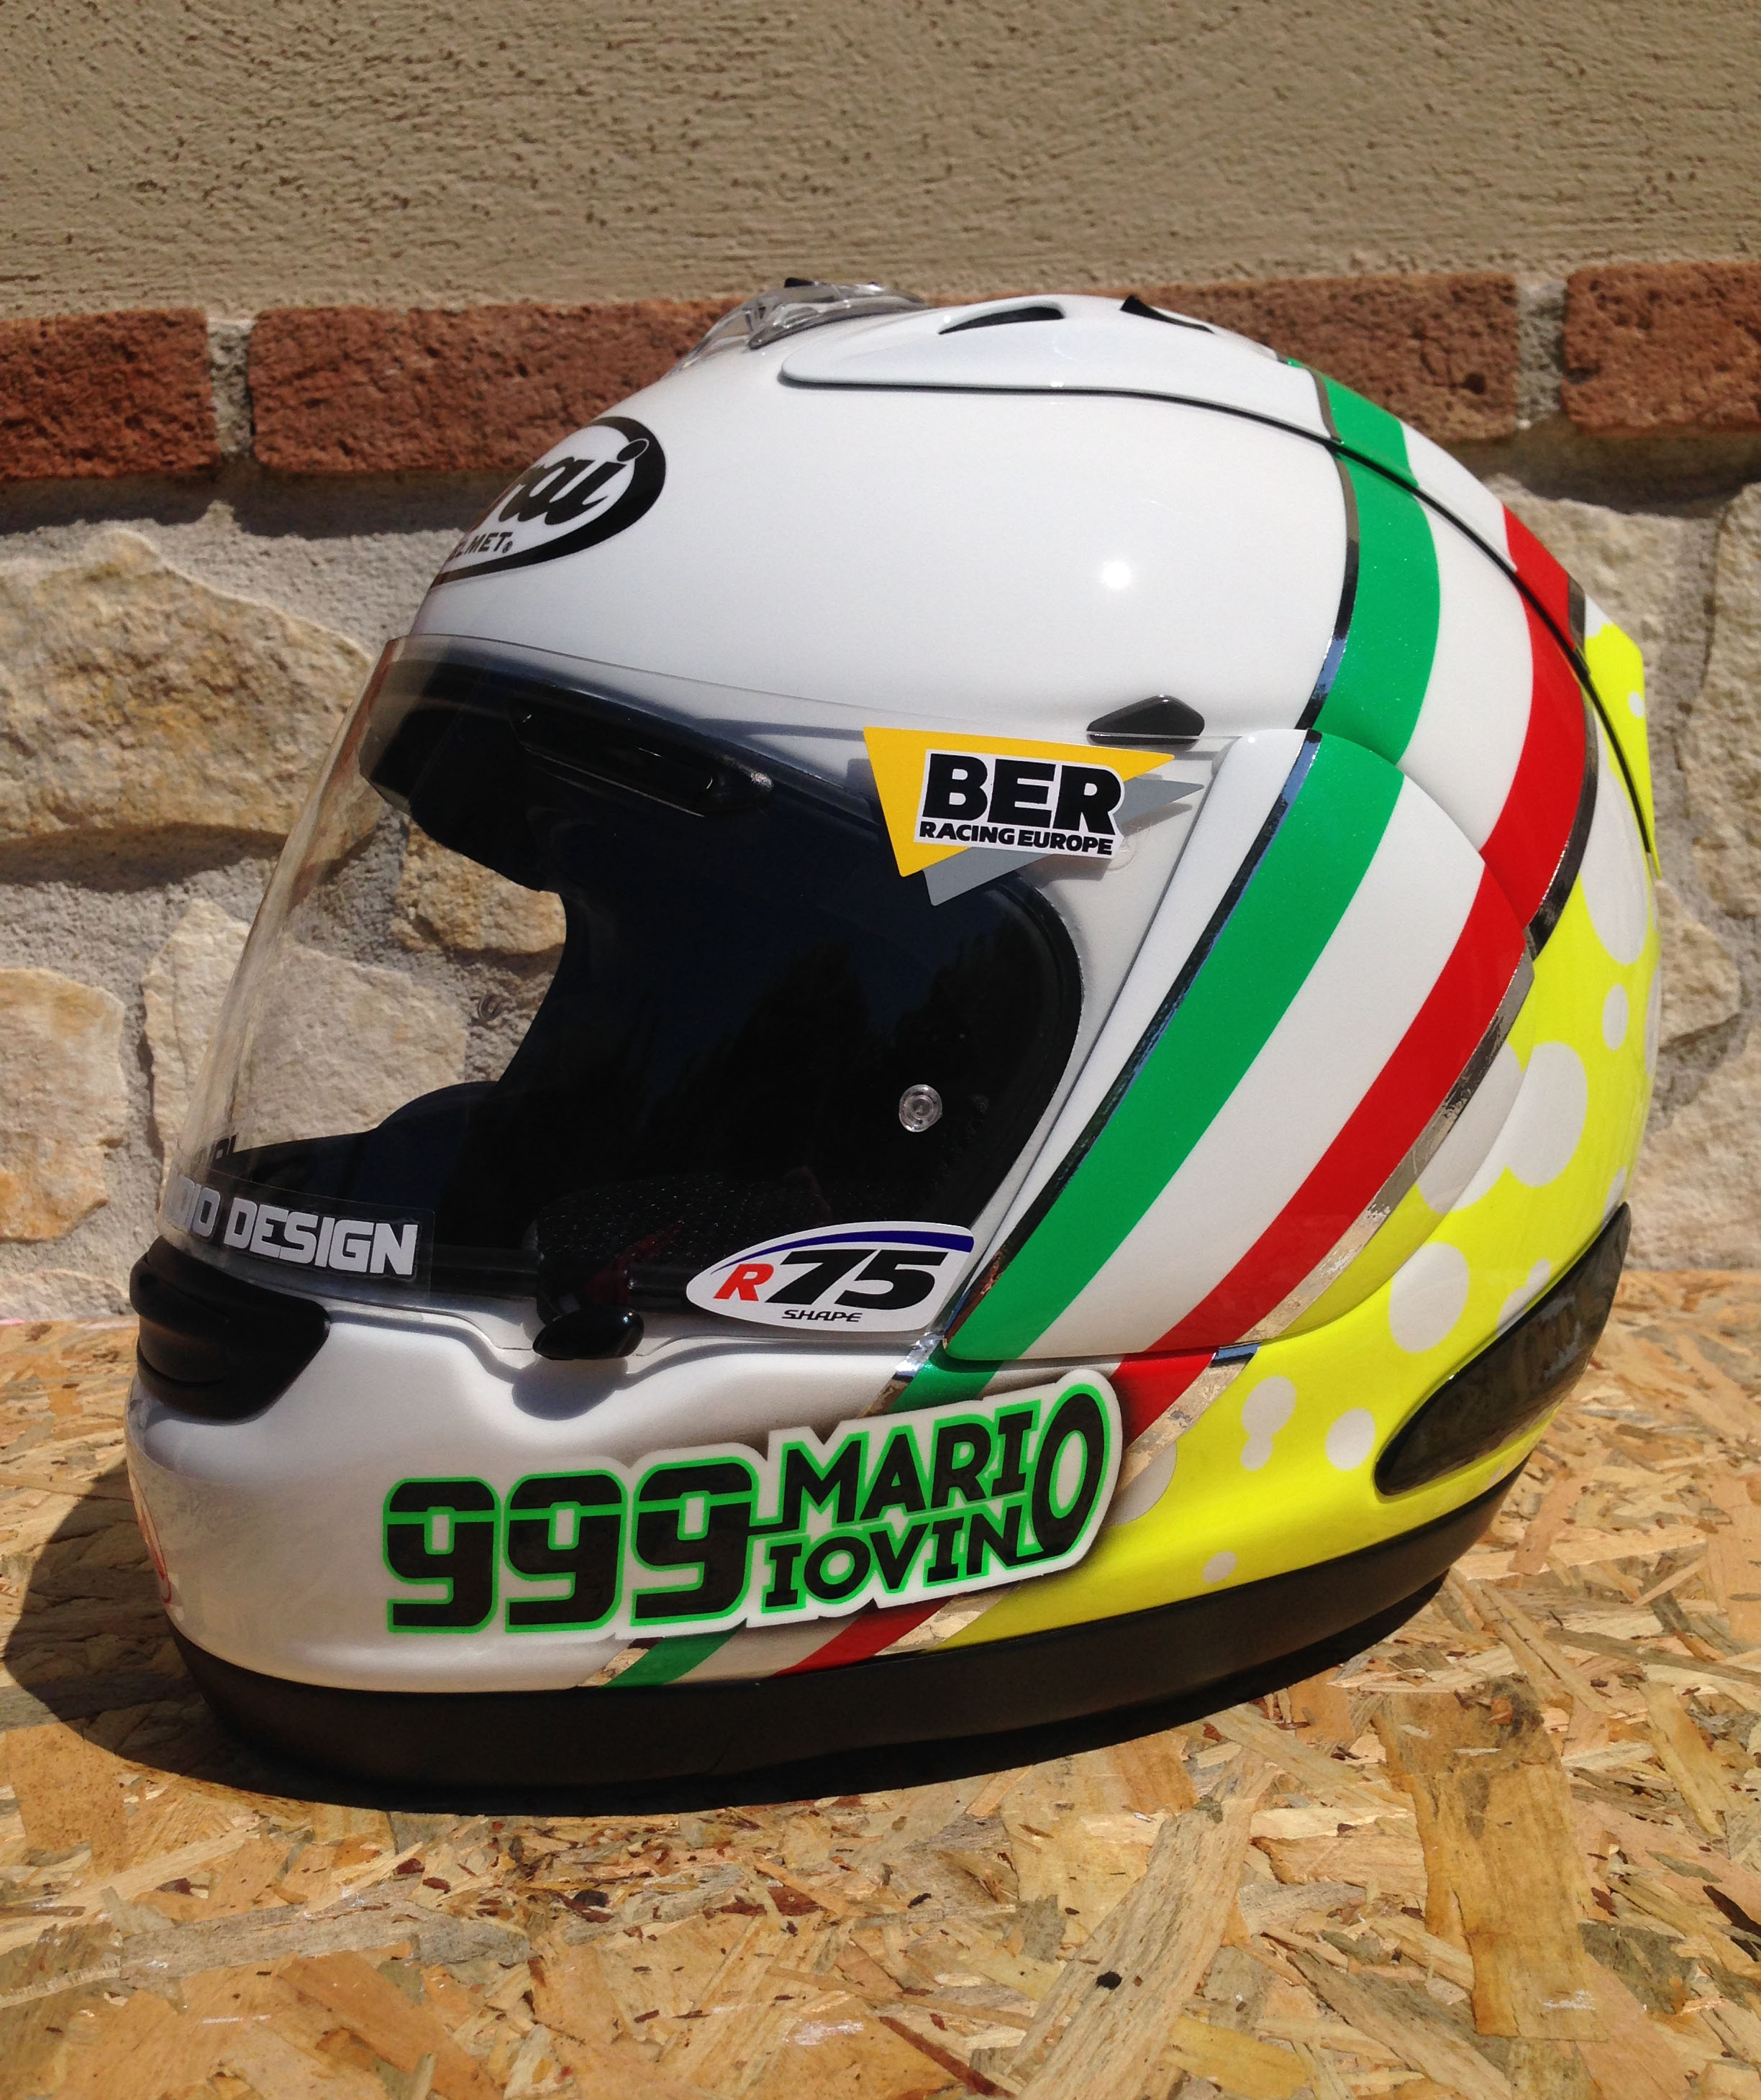 Arai RX-7 GP Mario Iovino